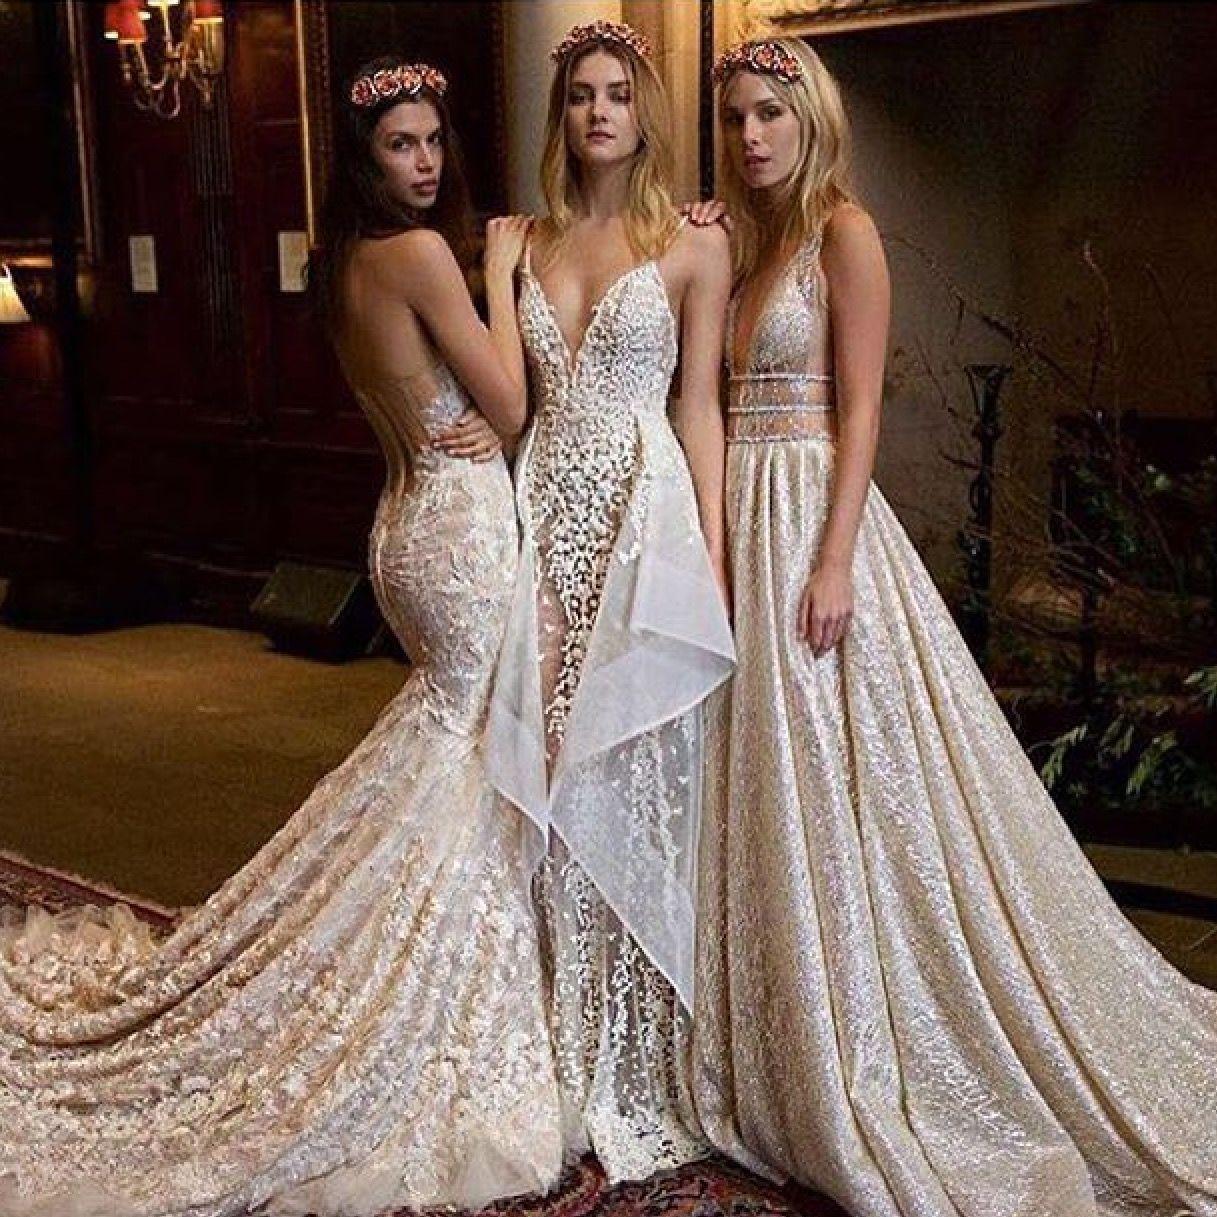 Gorgeous dress for wedding party  Gorgeous dresses  Sweet houses  Pinterest  Wedding dress